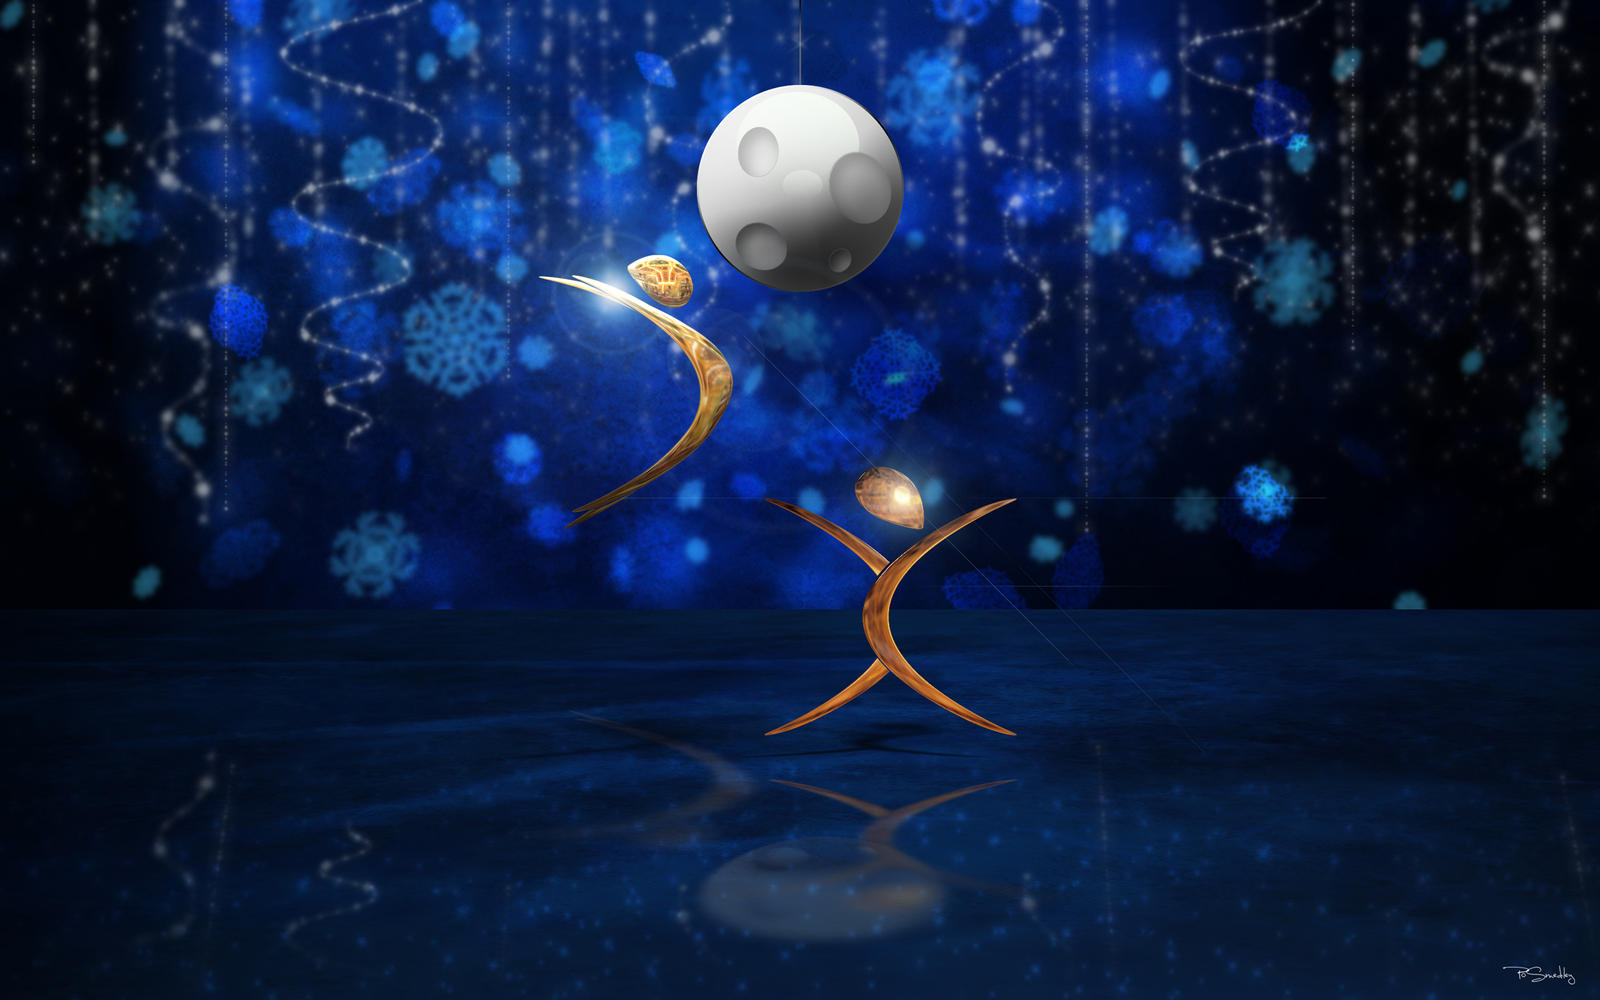 Winter Dance by PoSmedley